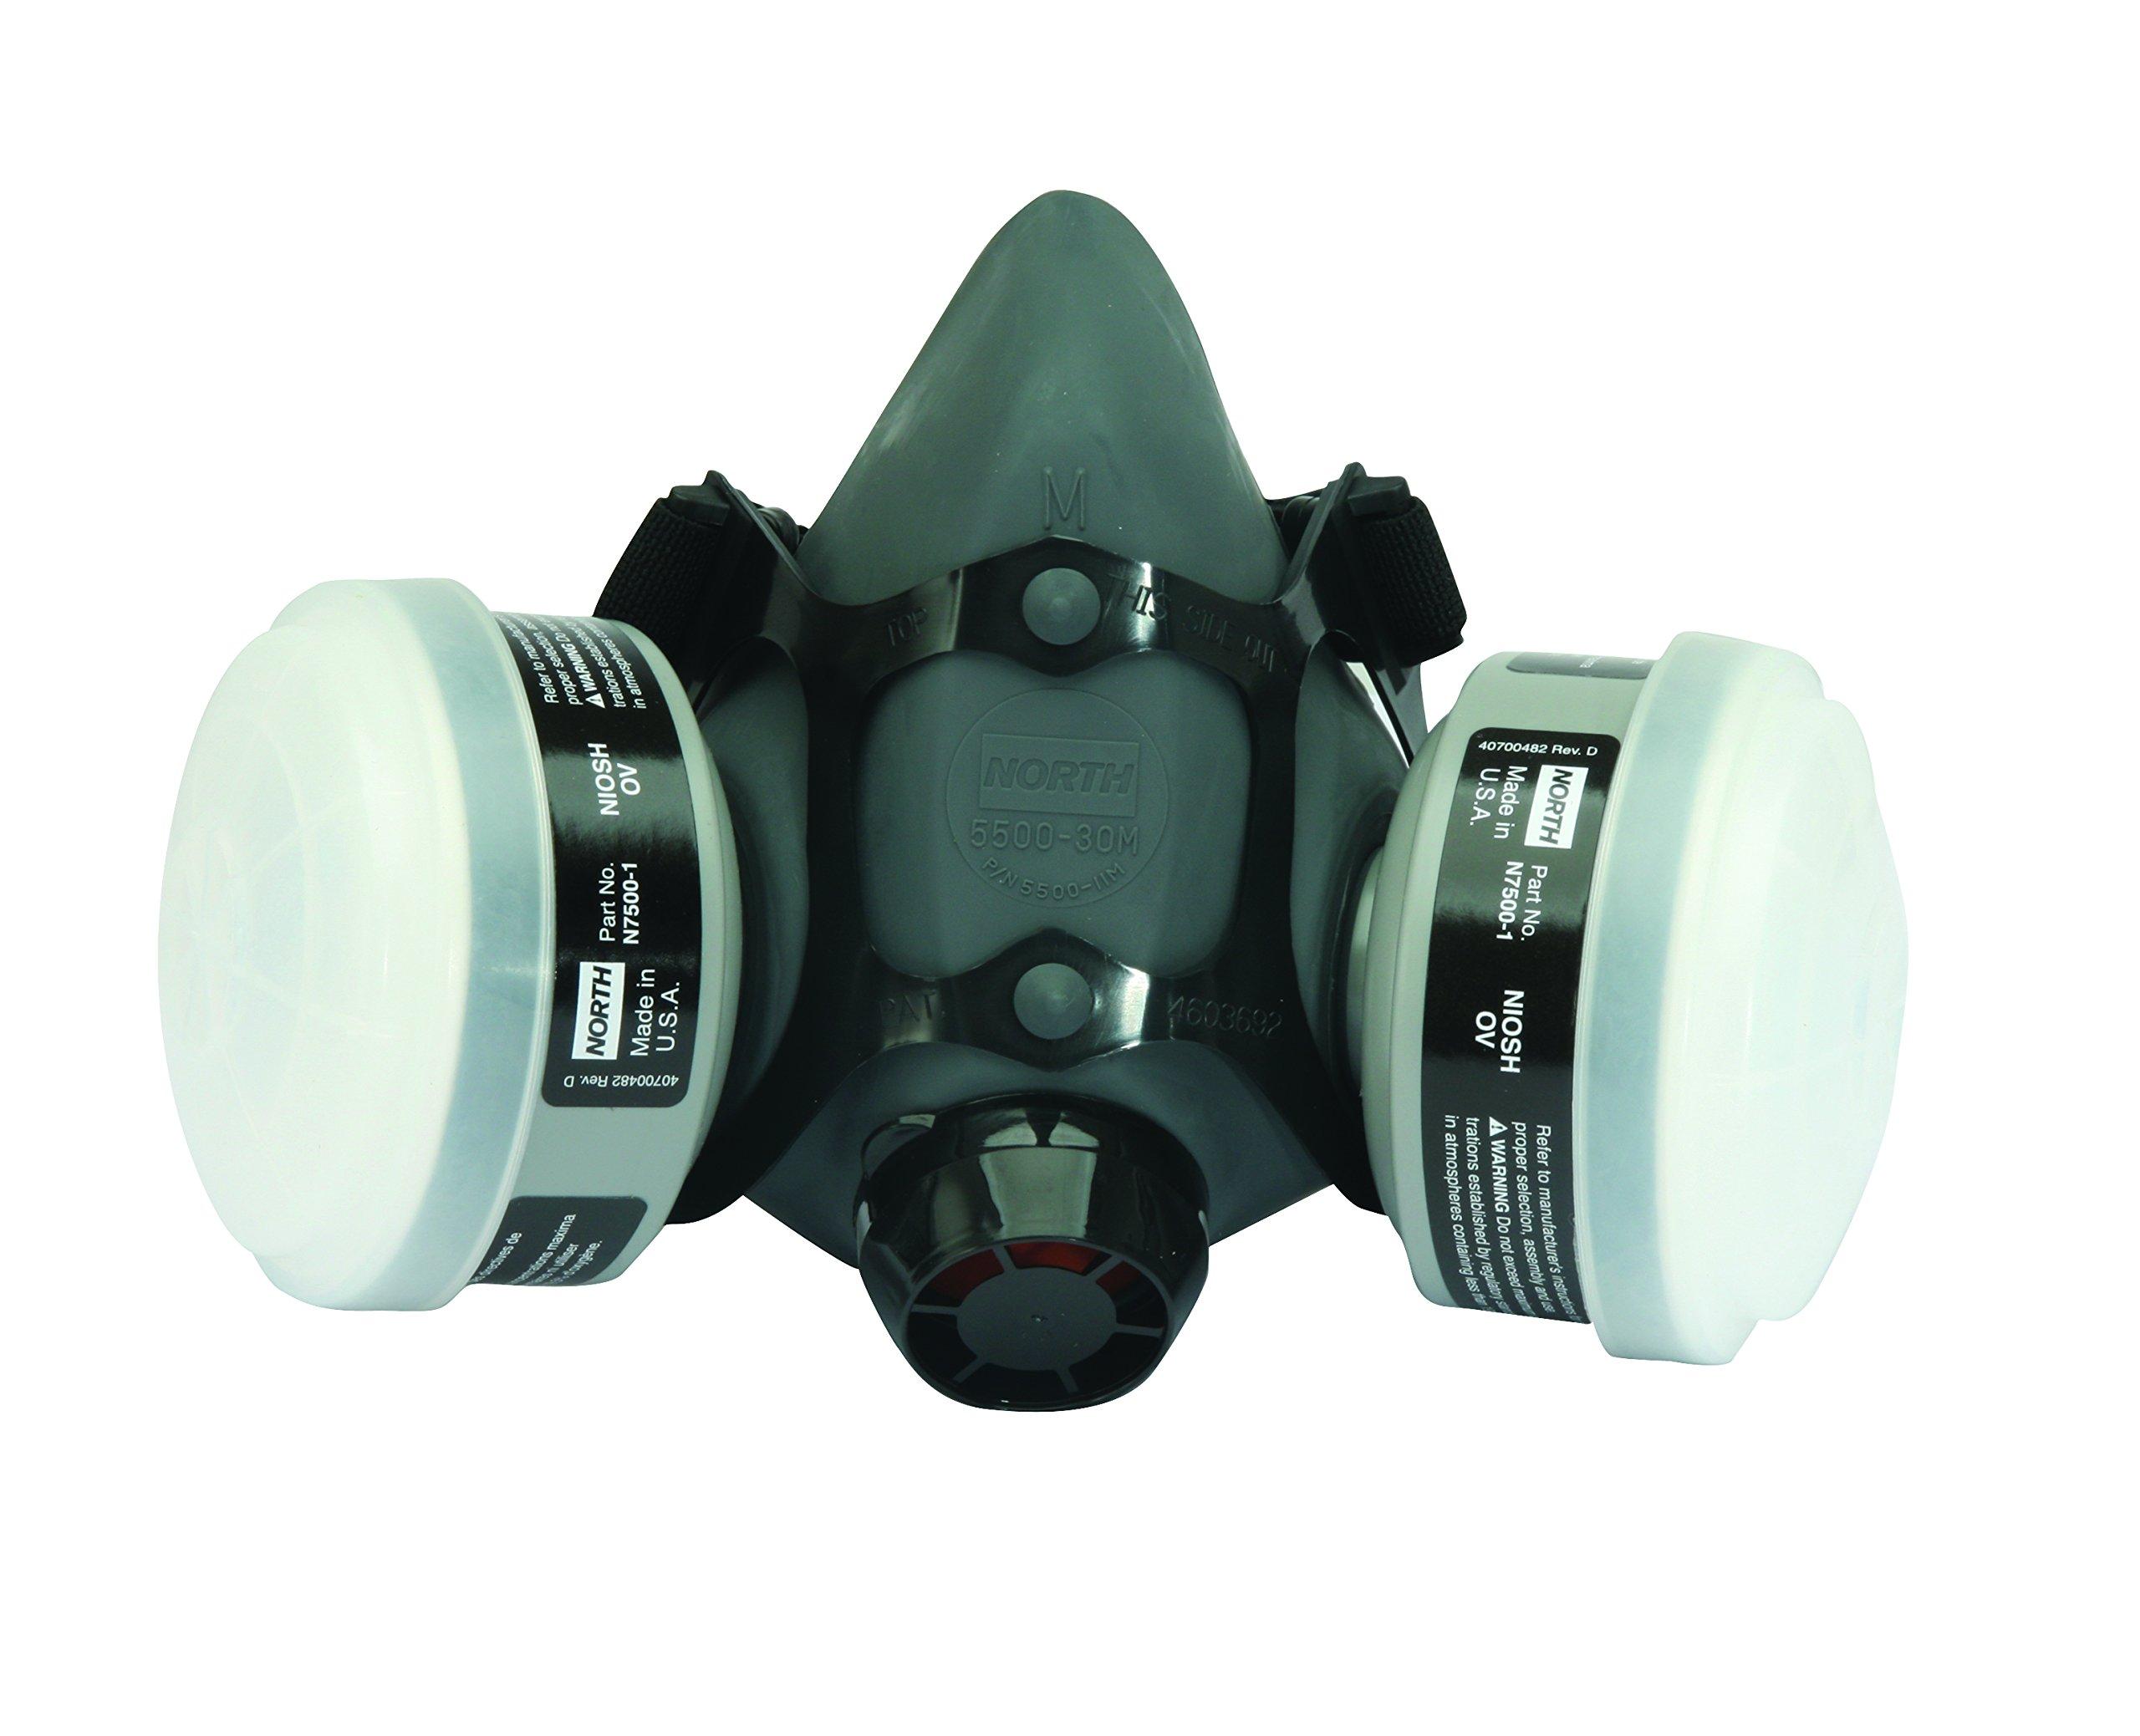 Stanley Paint Spray & Pesticide OV/R95 Respirator Mask (RST-64027)